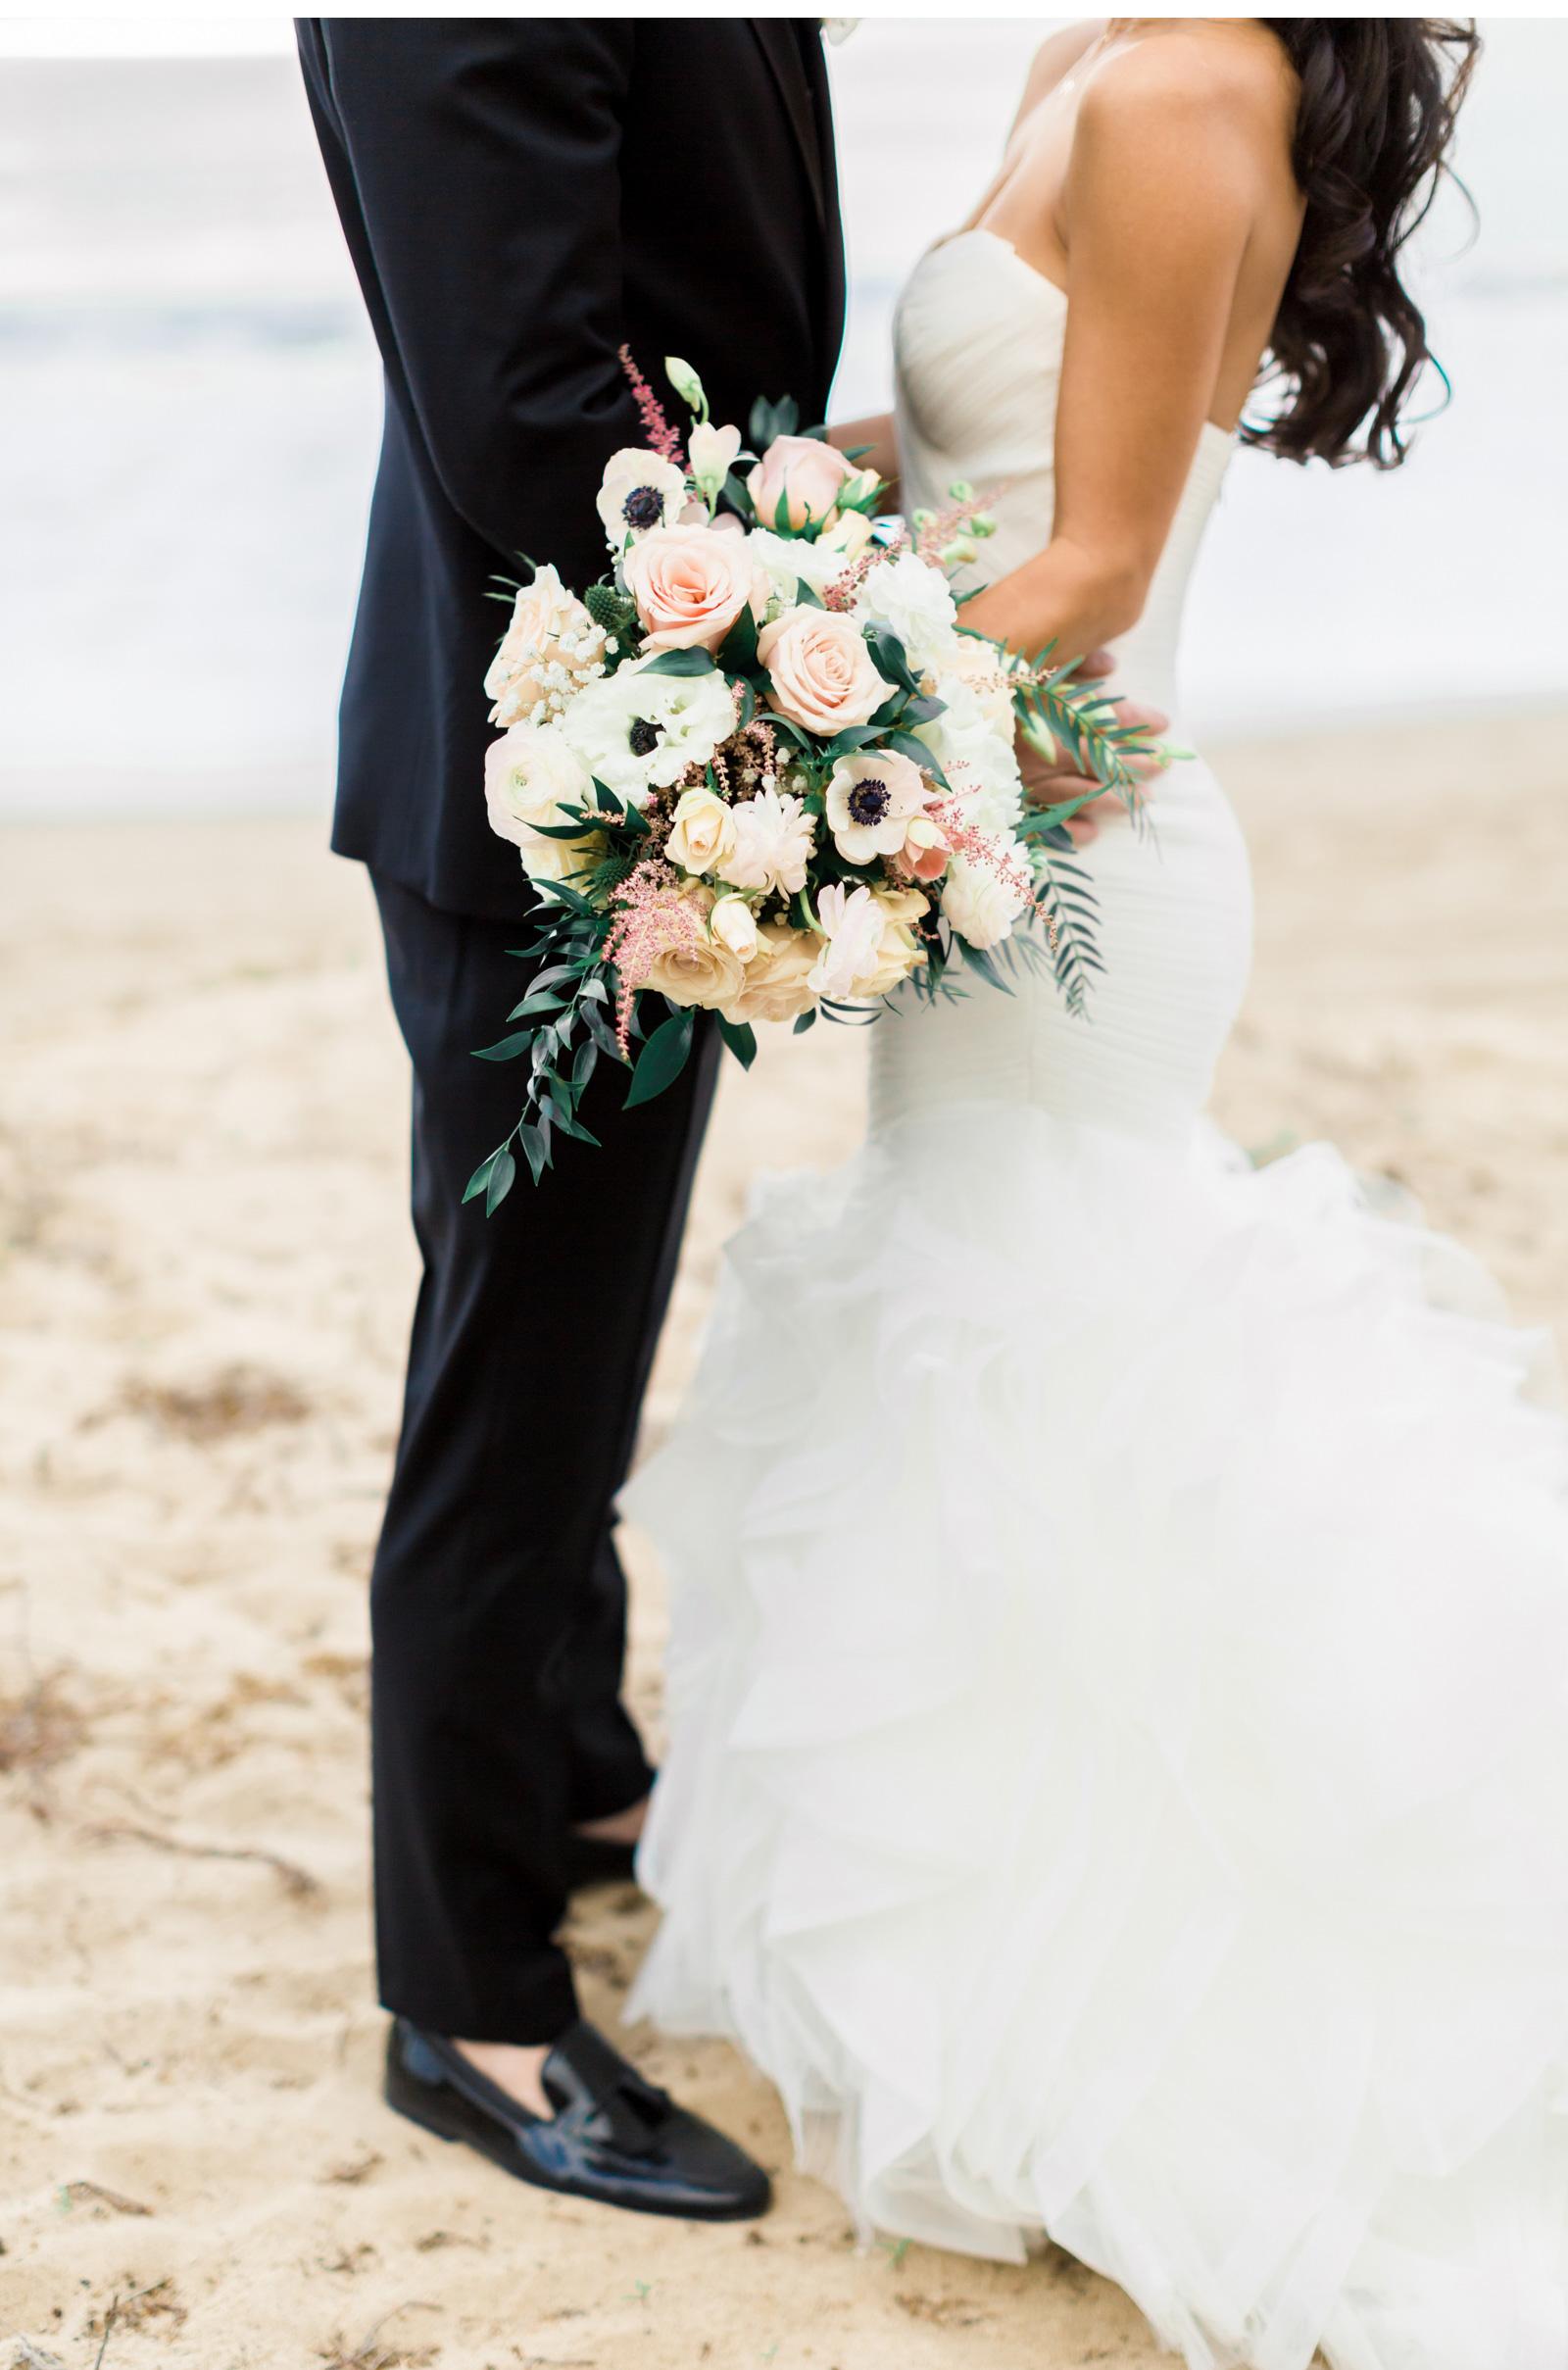 Malibu-First-Look-Natalie-Schutt-Photography-Rod-Brewster_10.jpg